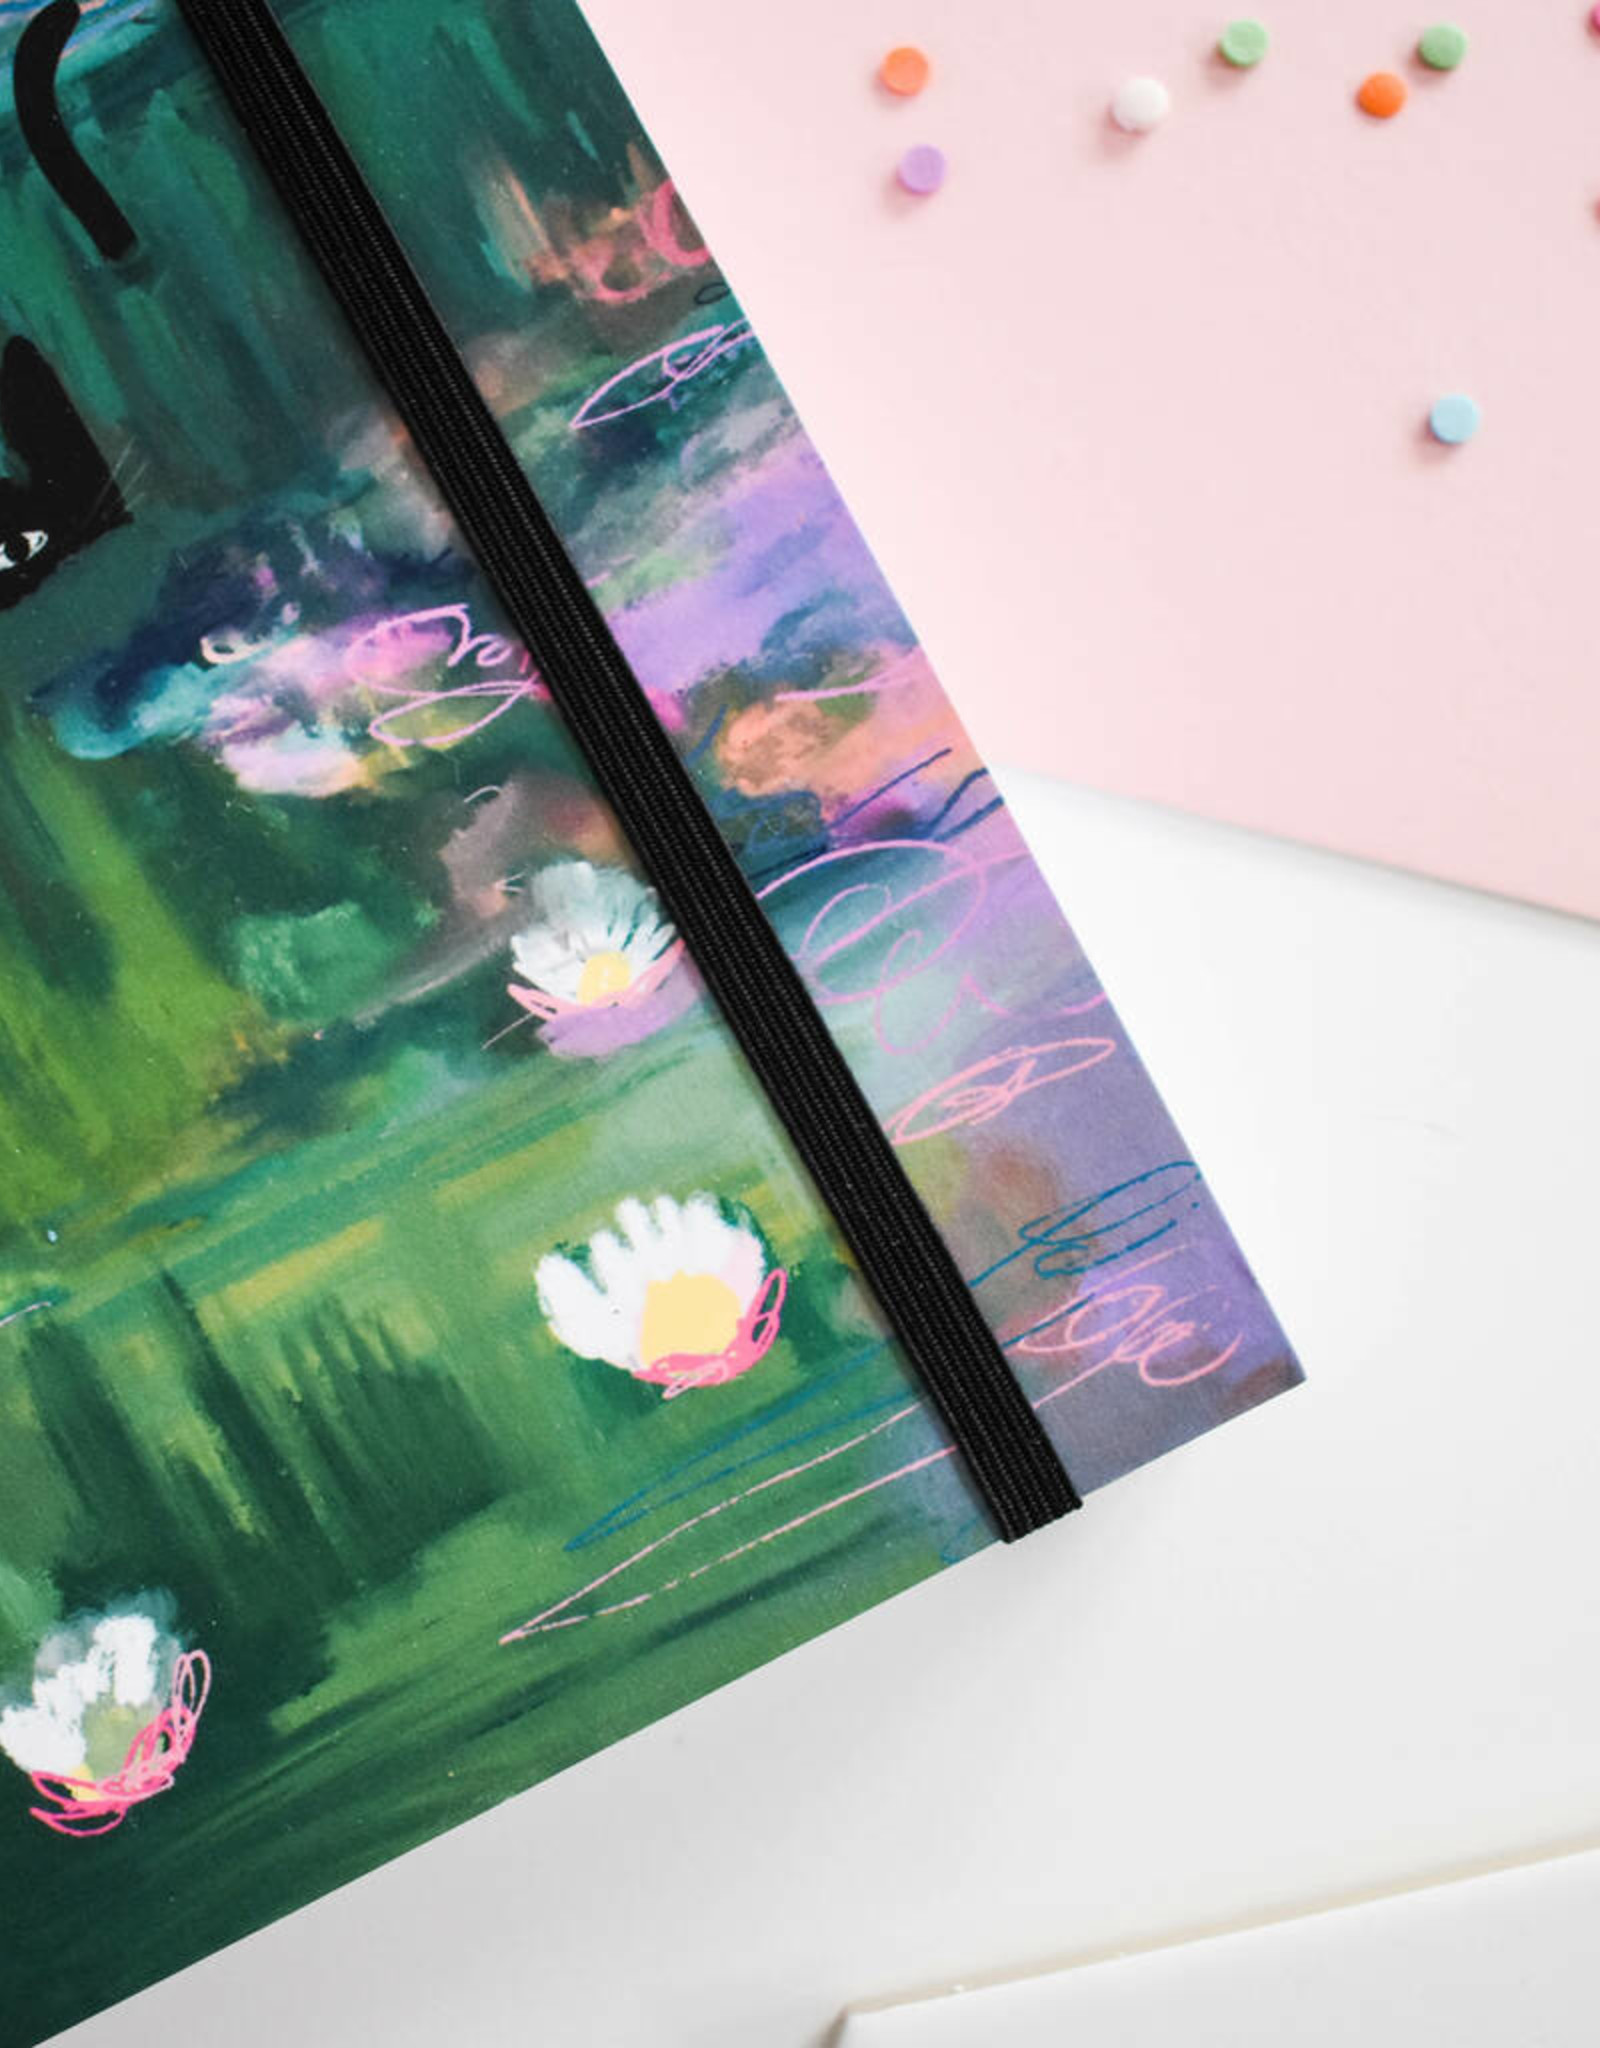 Niaski Niaski - Claws monet - sketchbook